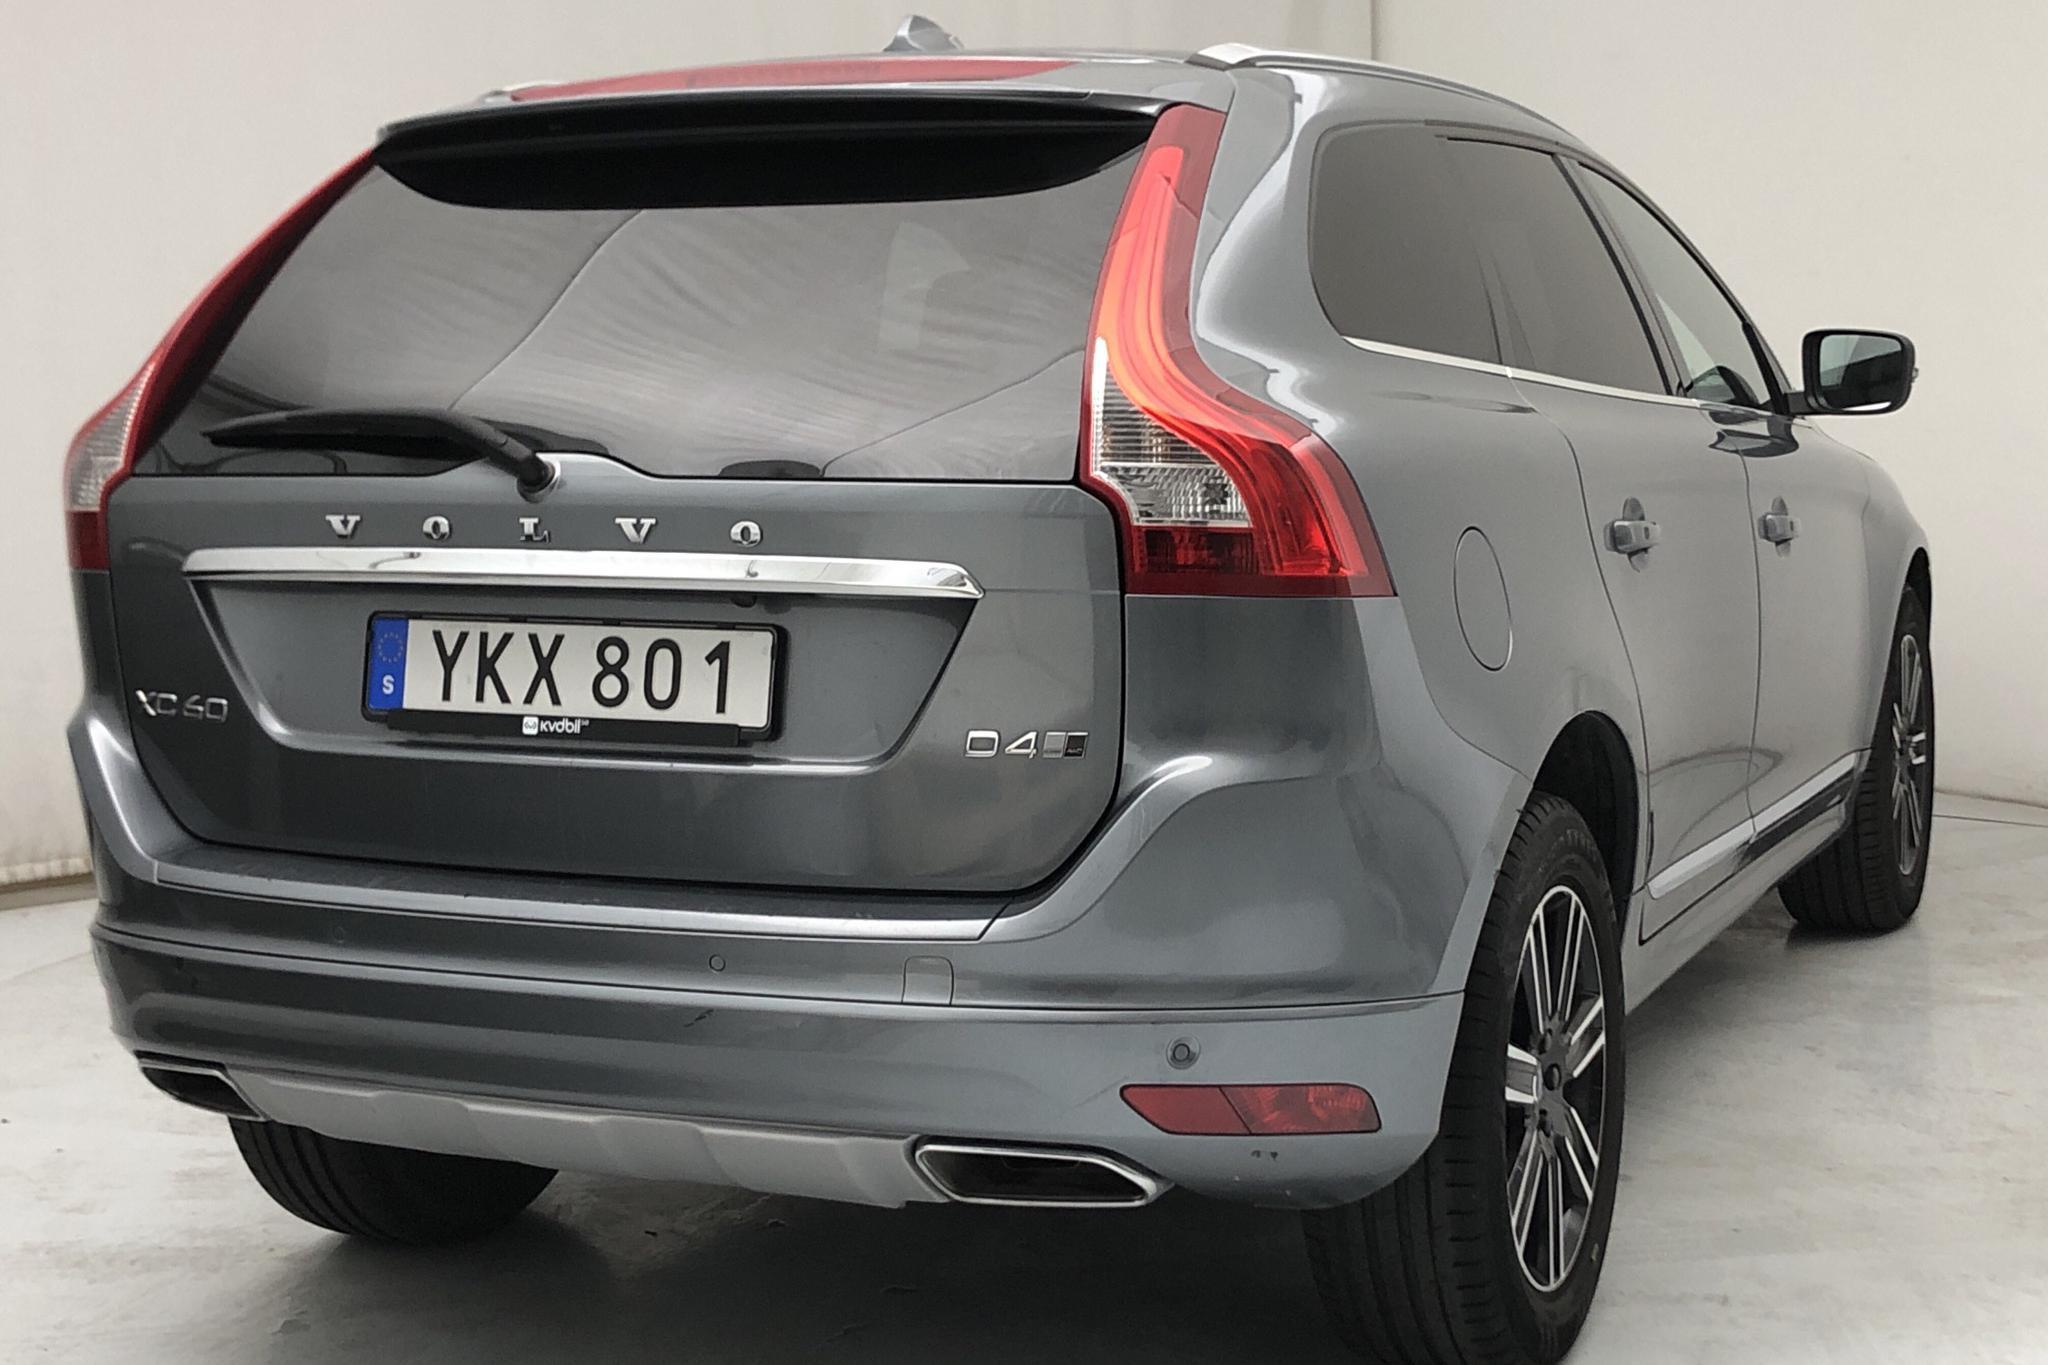 Volvo XC60 D4 AWD (190hk) - 9 429 mil - Manuell - grå - 2017